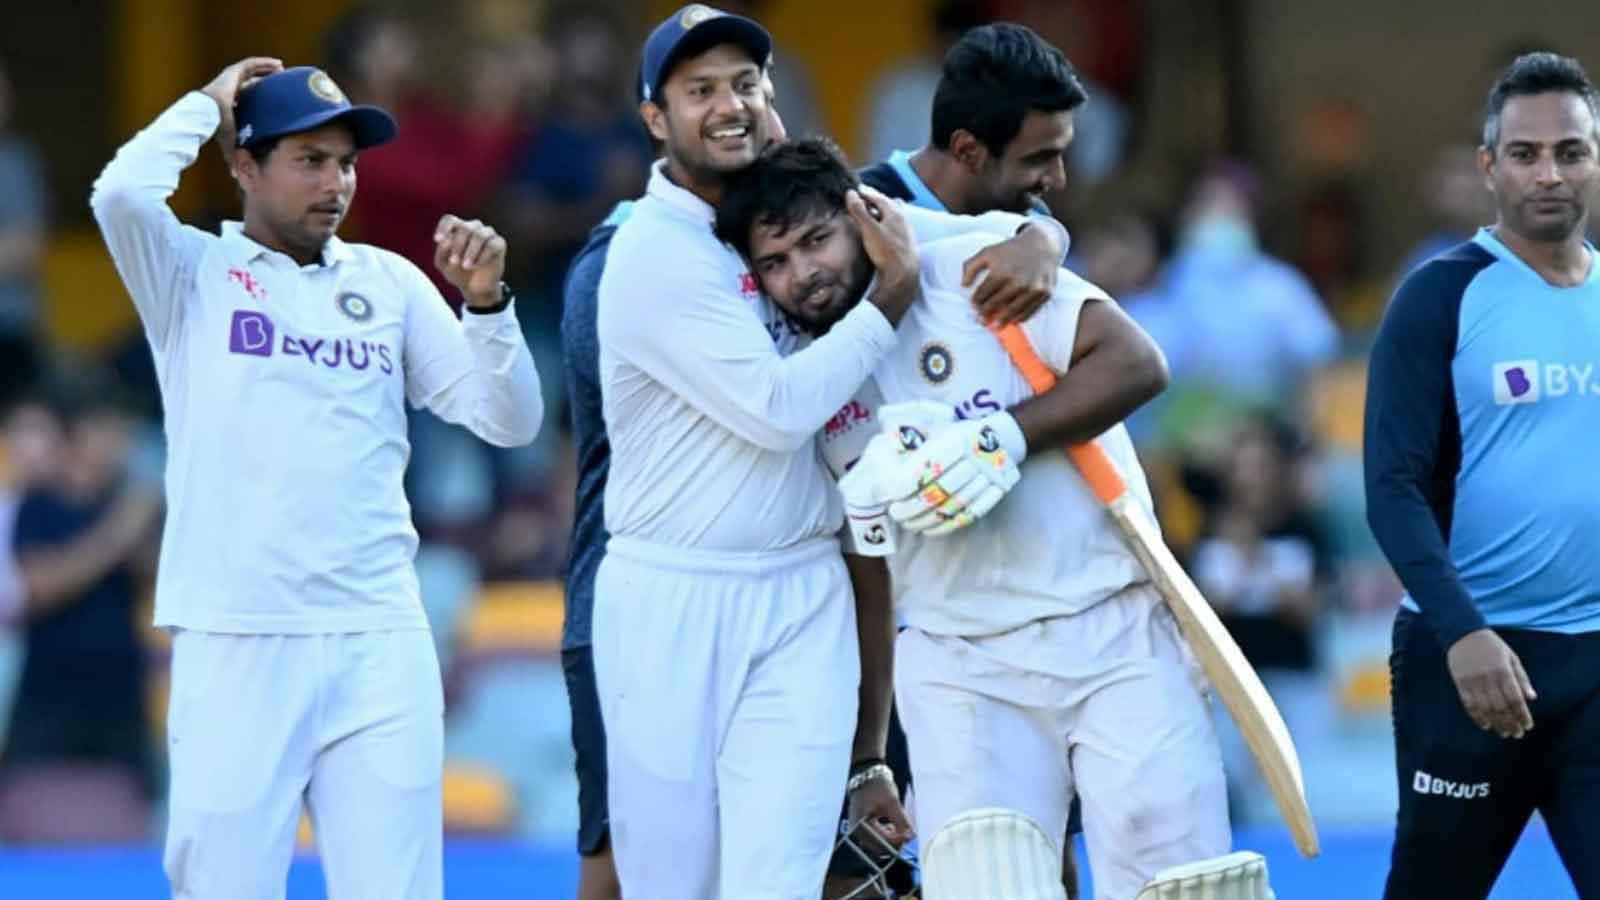 winning-in-australia-significant-achievement-rajeev-shukla